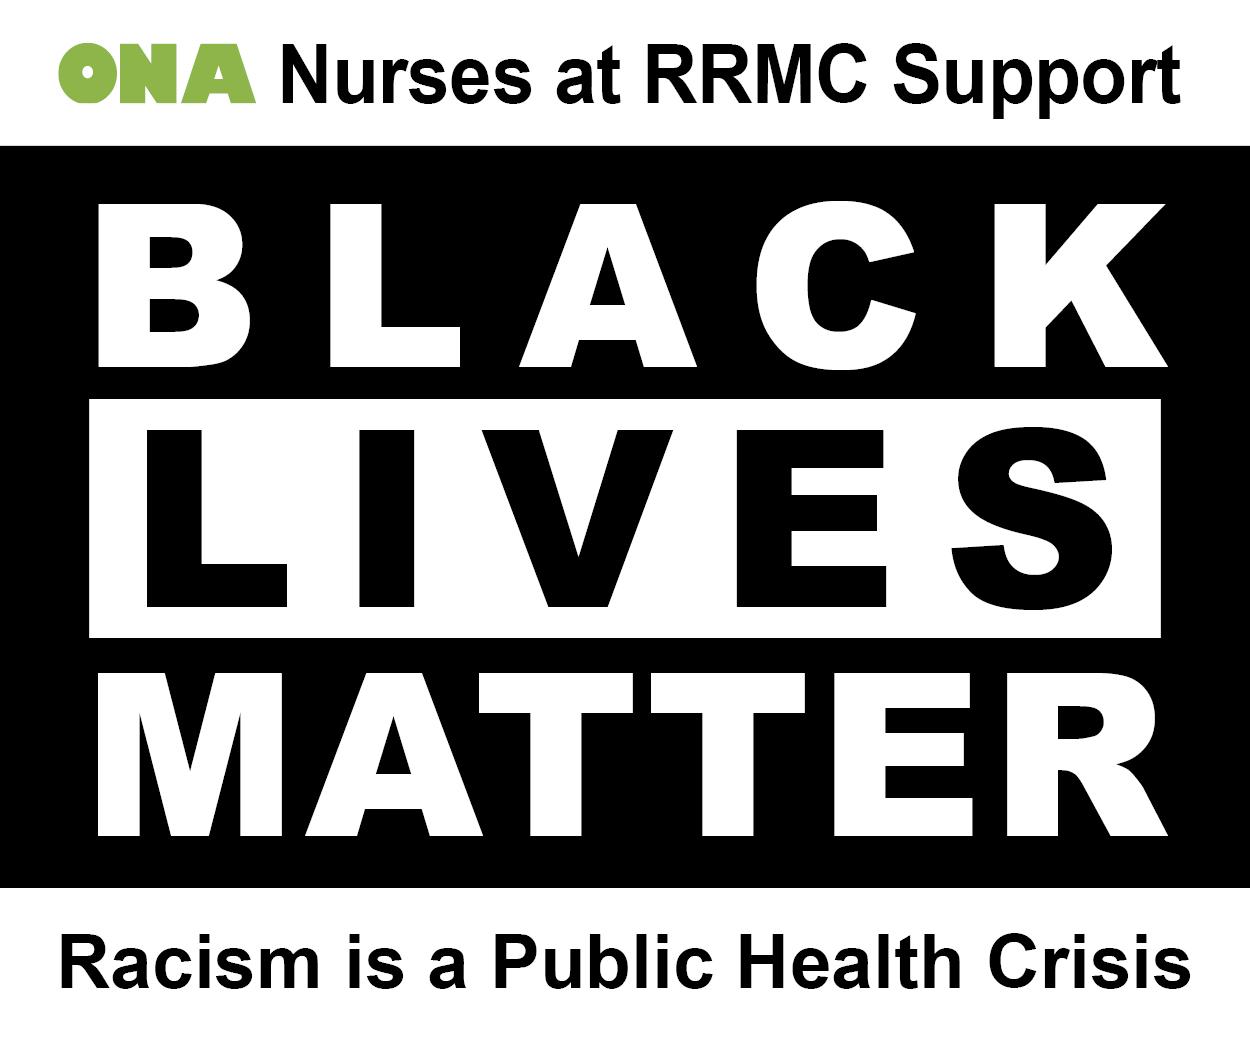 ONA Nurses at RRMC Support Black Lives Matter